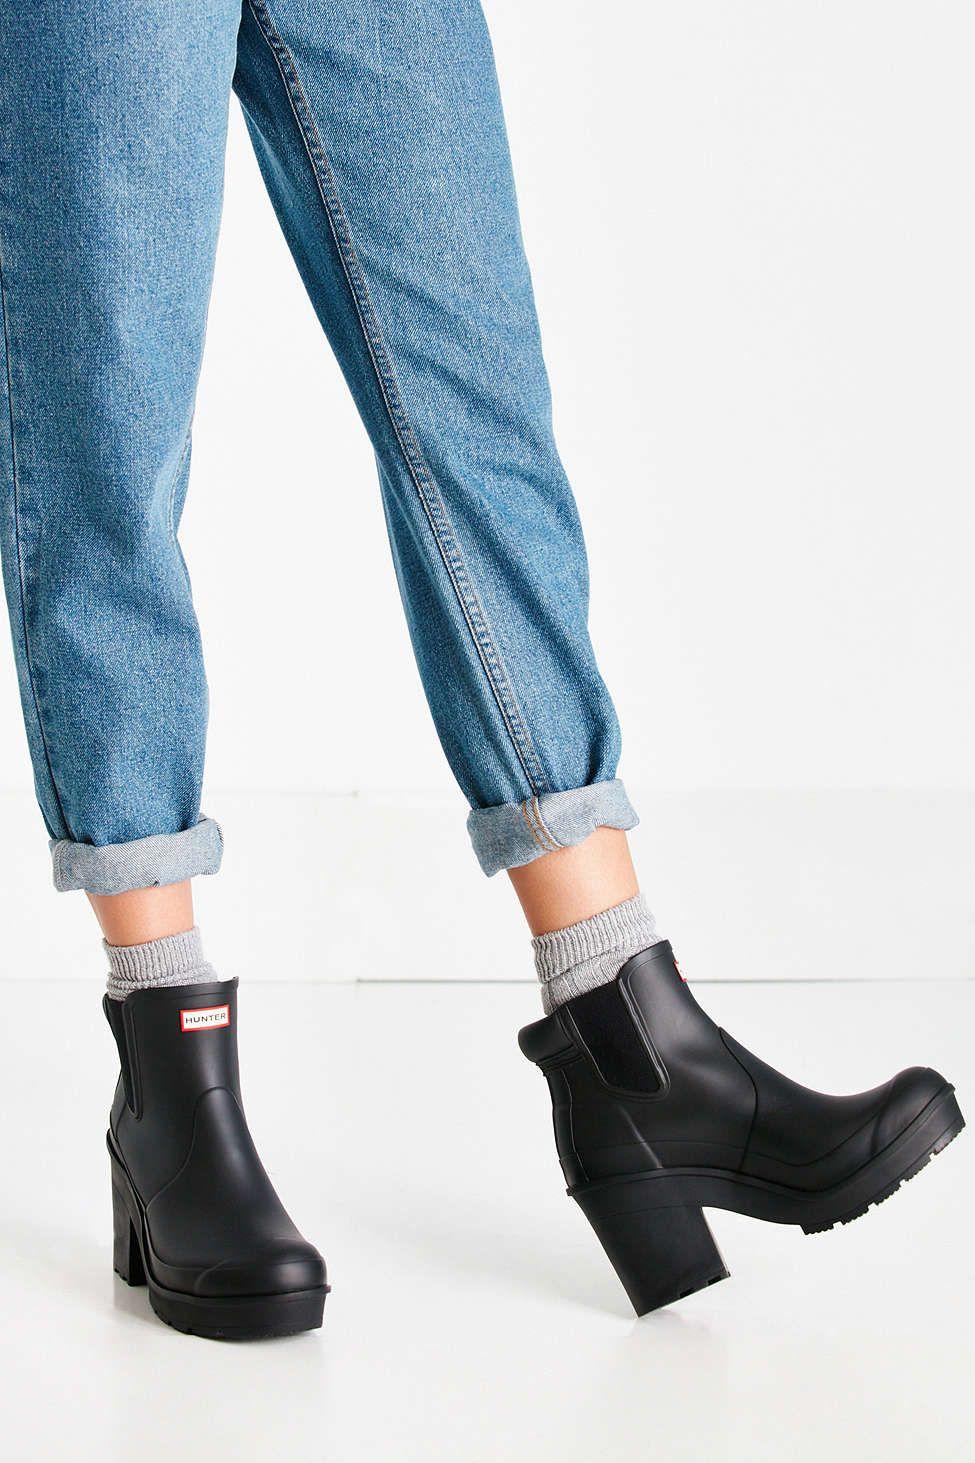 hunter original block heel chelsea boot urban outfitters w a n t pinterest hunter. Black Bedroom Furniture Sets. Home Design Ideas